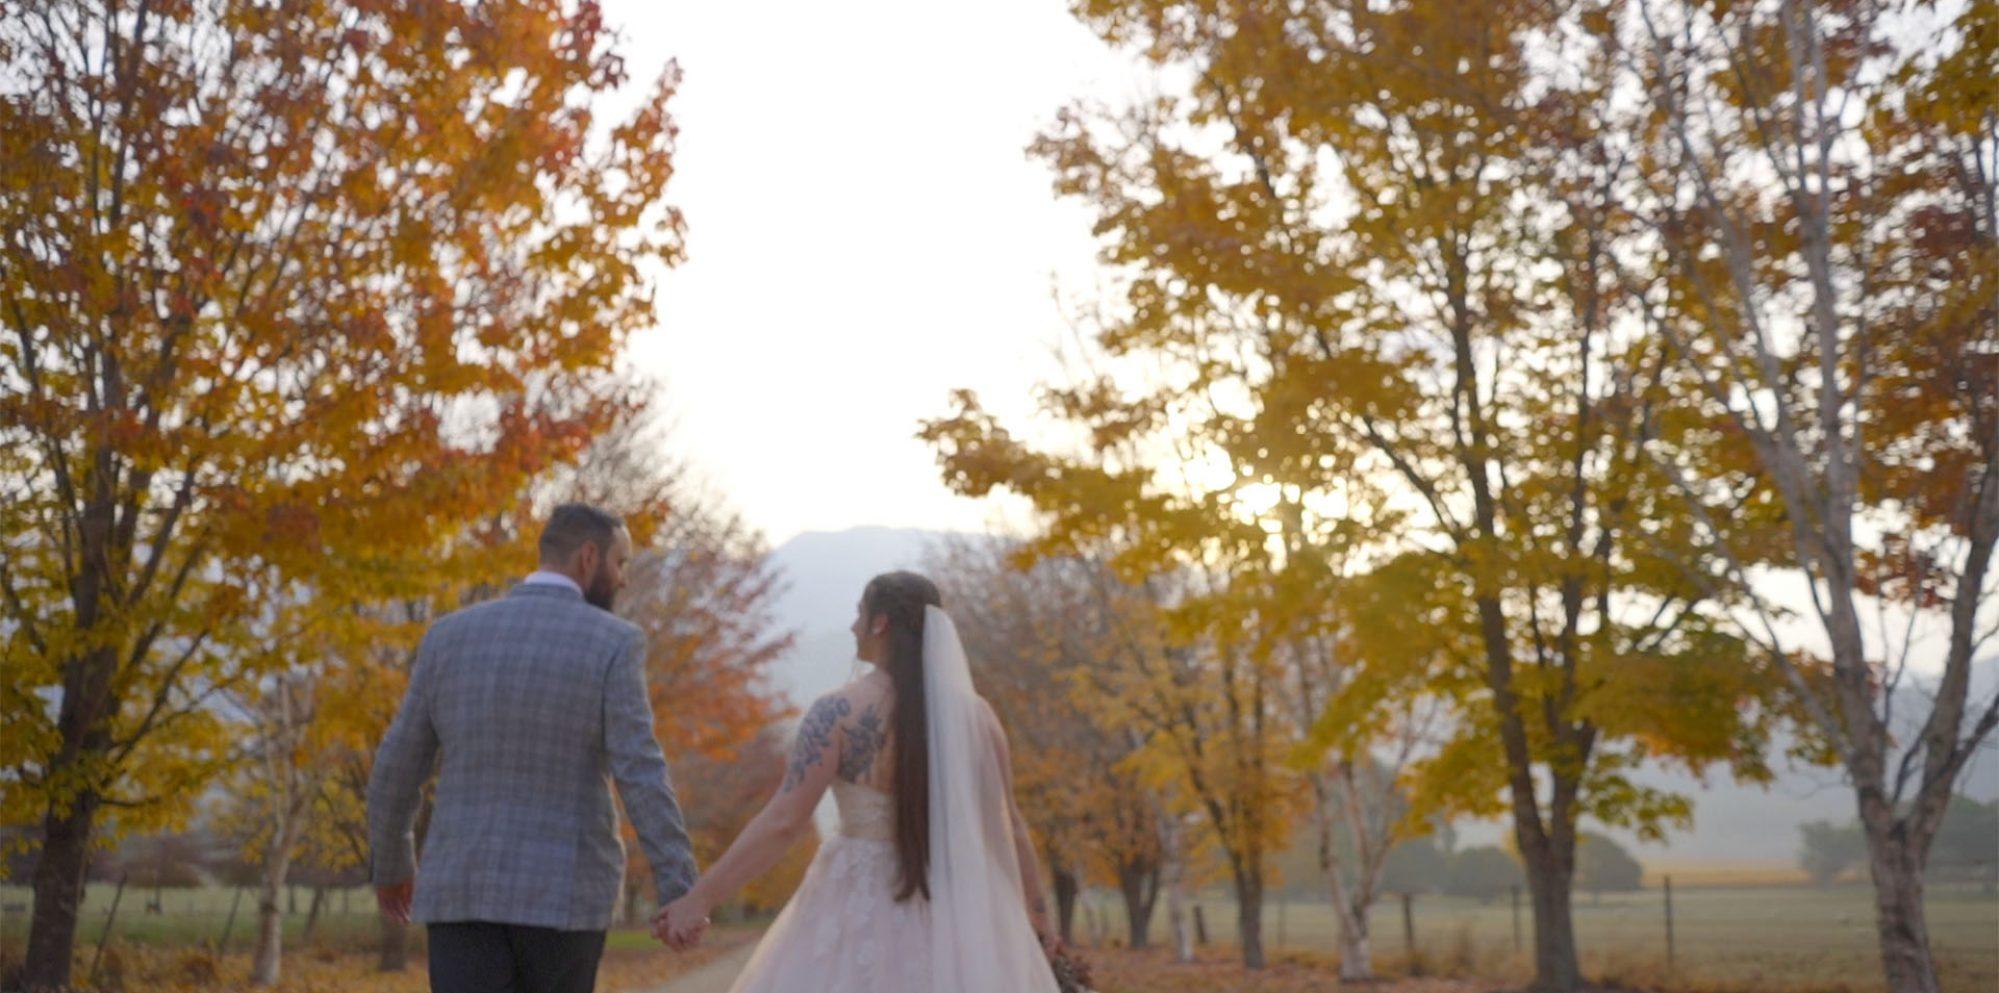 Jessica & andrew wedding video @ merrimeet cottages bright